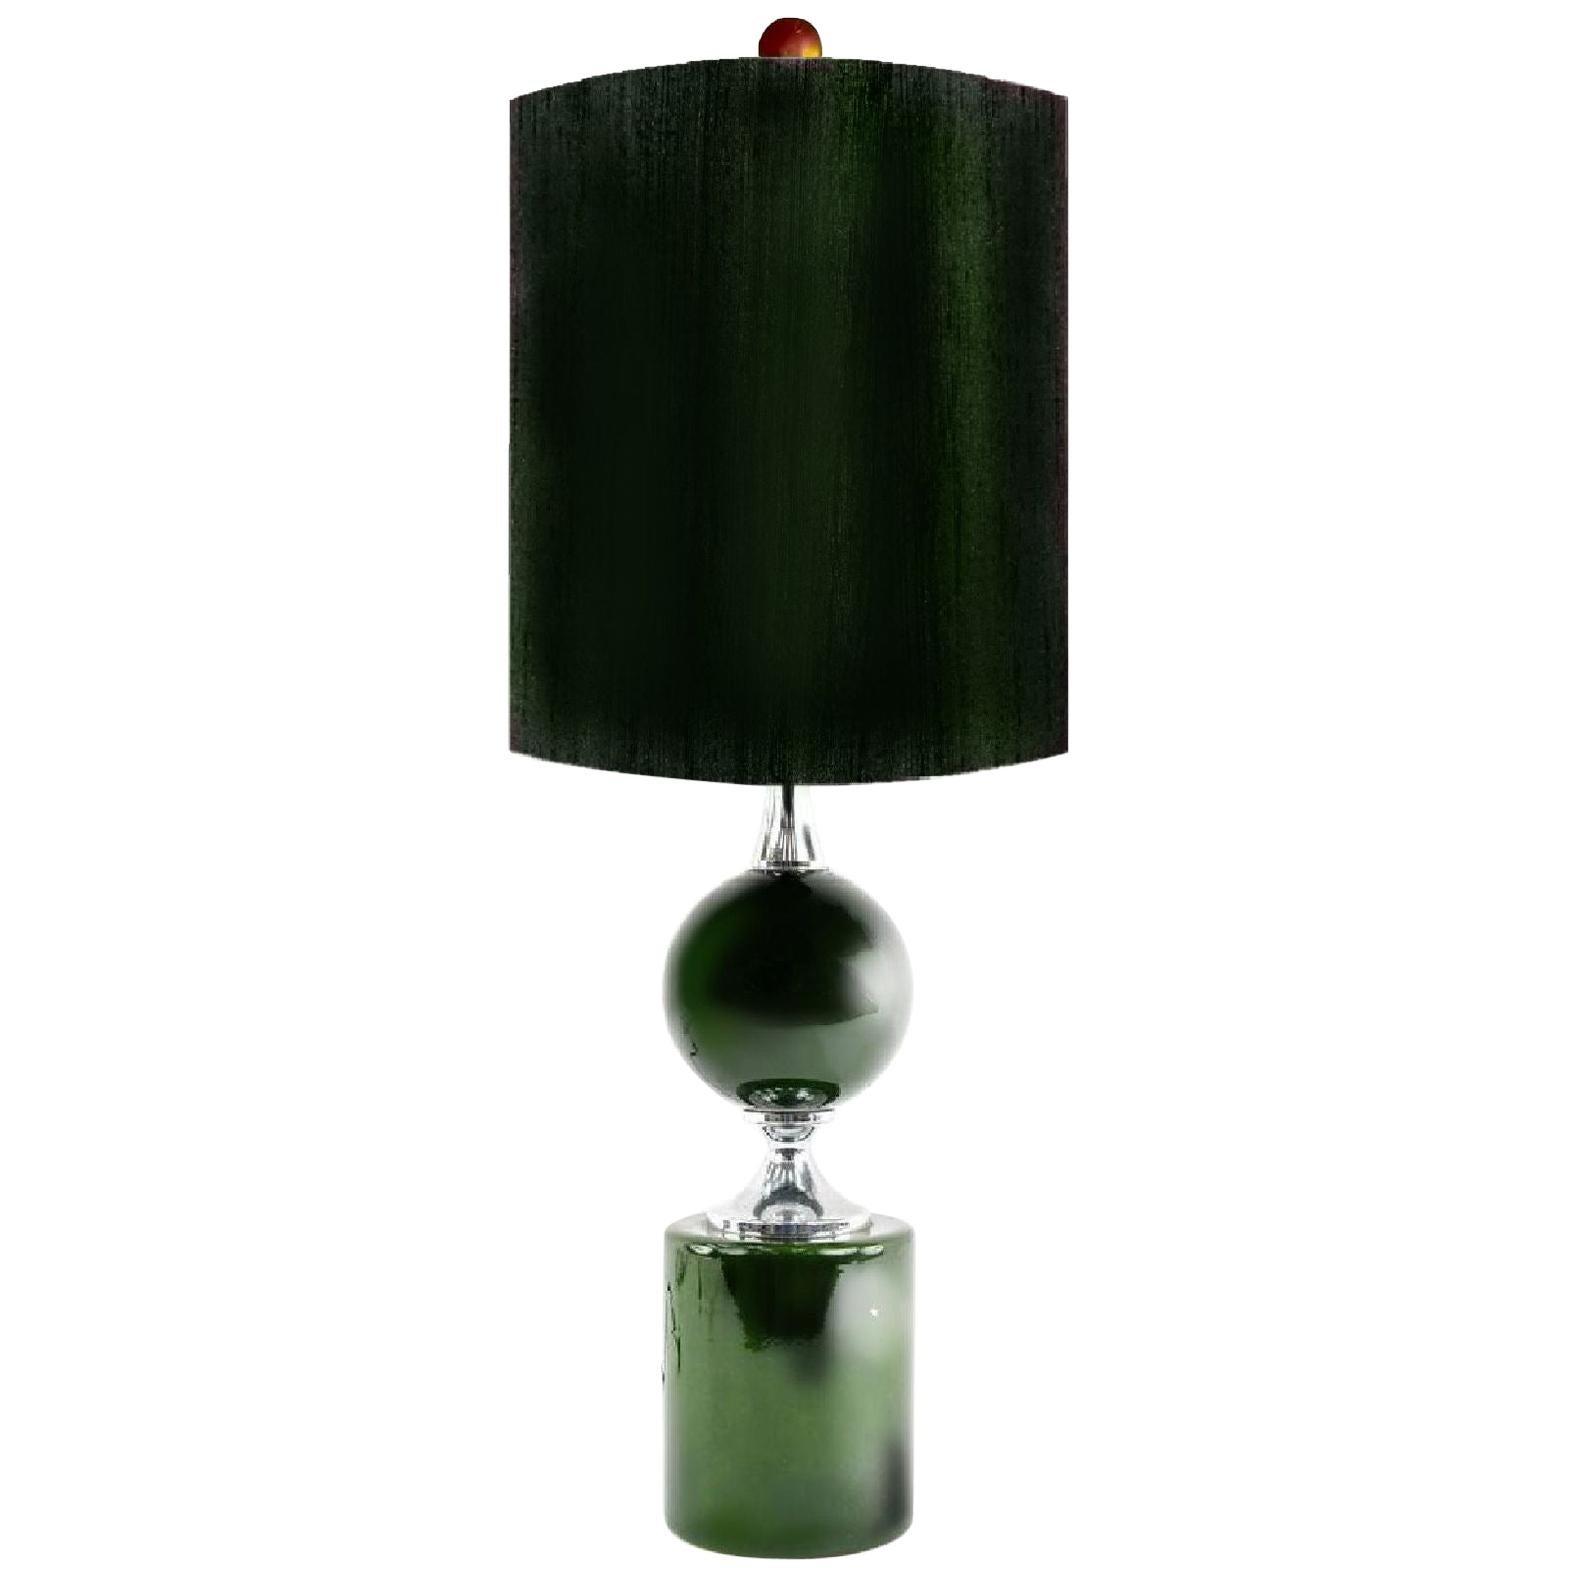 Midcentury French Modern Enameled Brass Geometric Lamp, Green, Maison Barbier